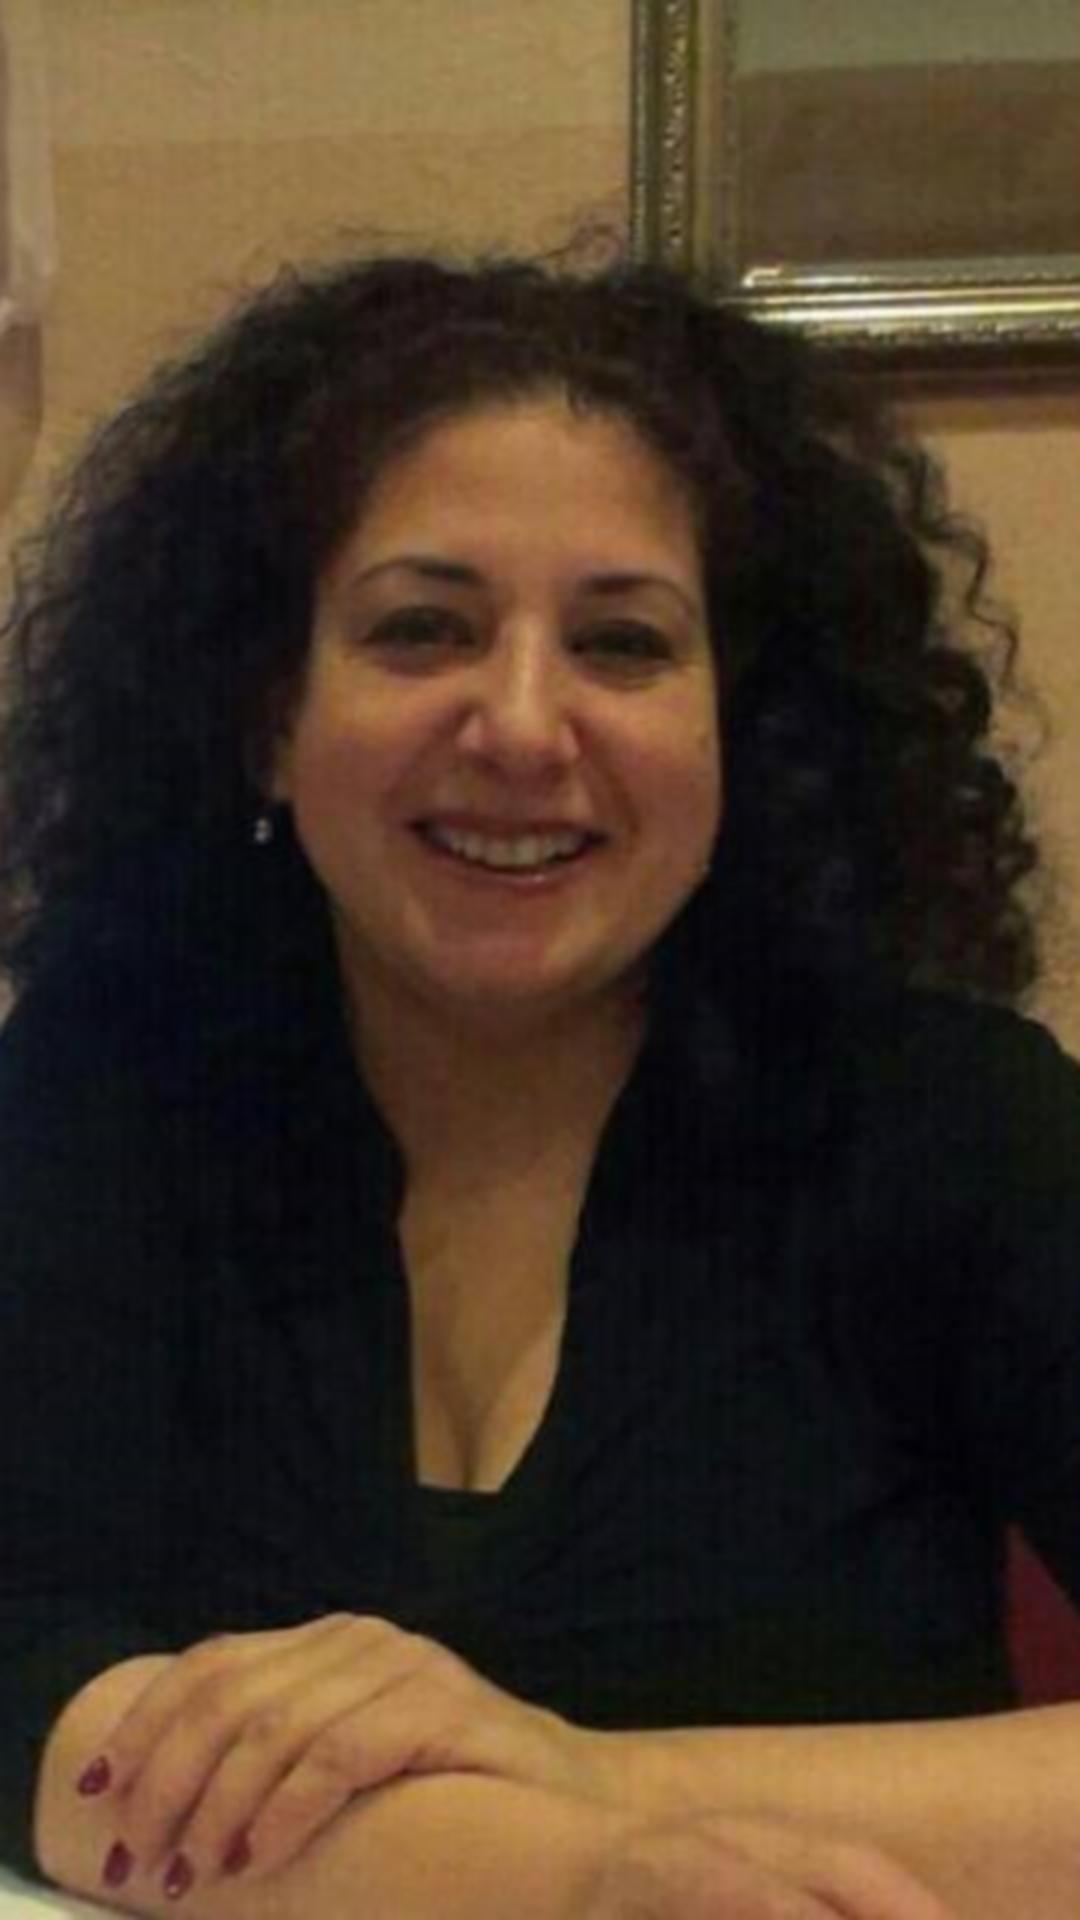 Heide Tawakoli